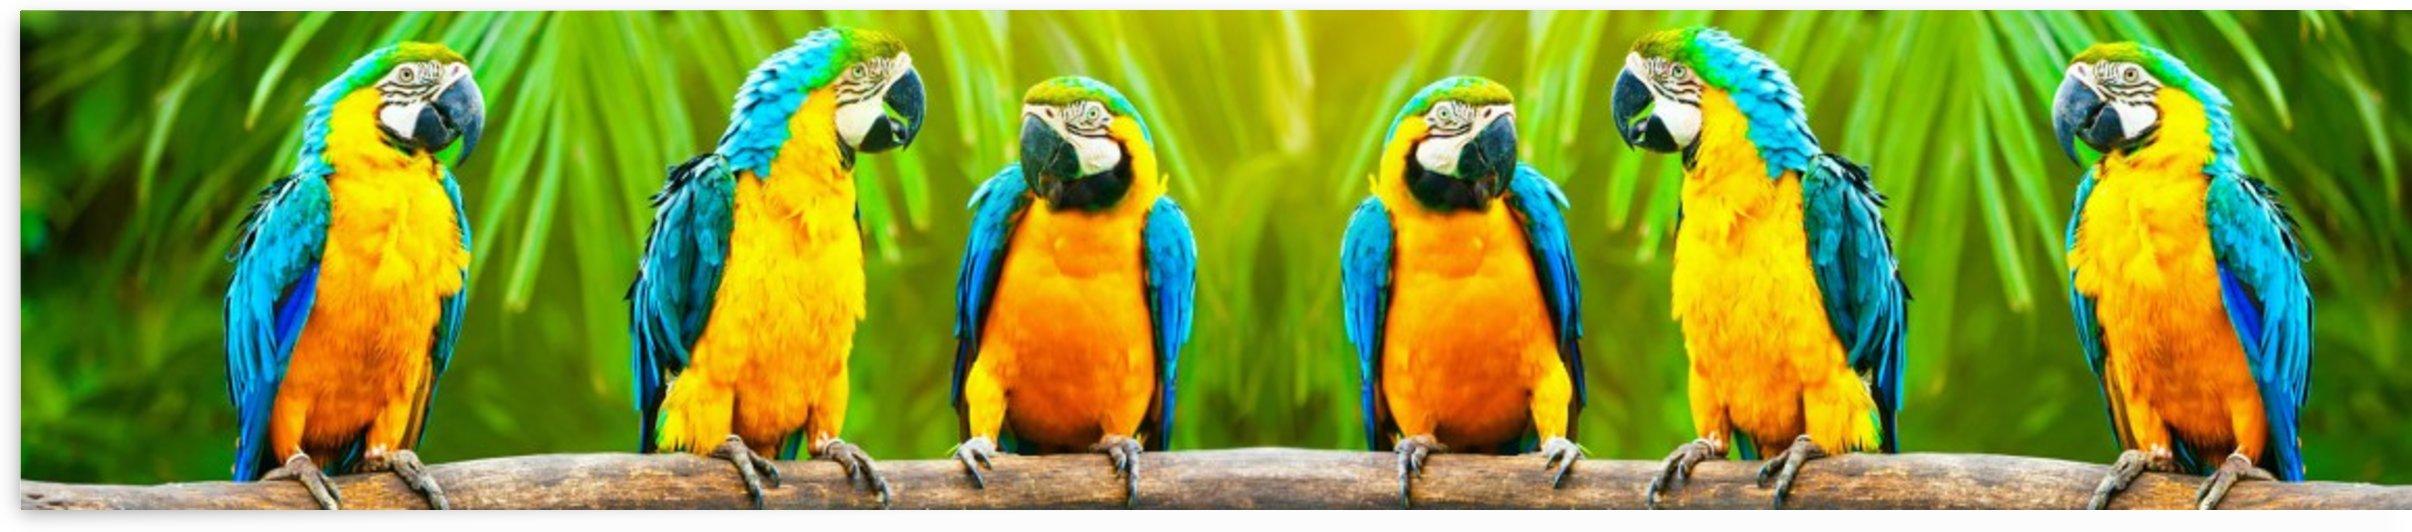 Parrots talk by AmilenaCollection